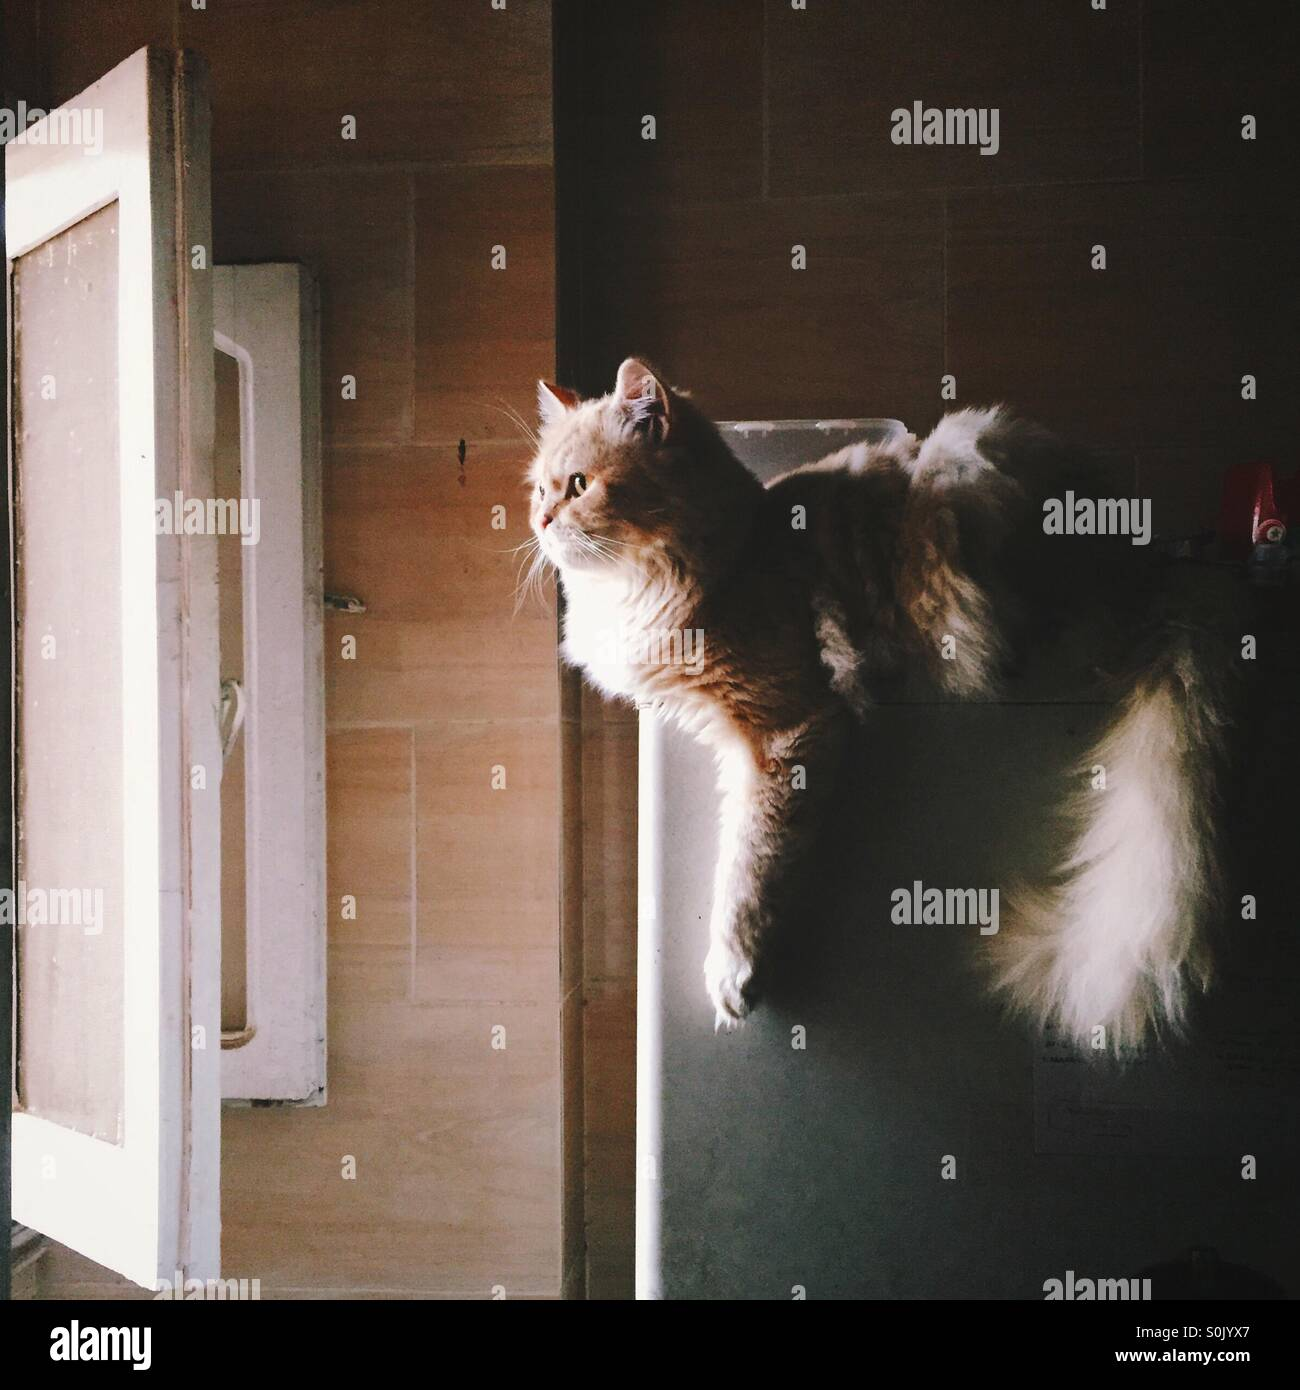 Flying dutchcat! - Stock Image